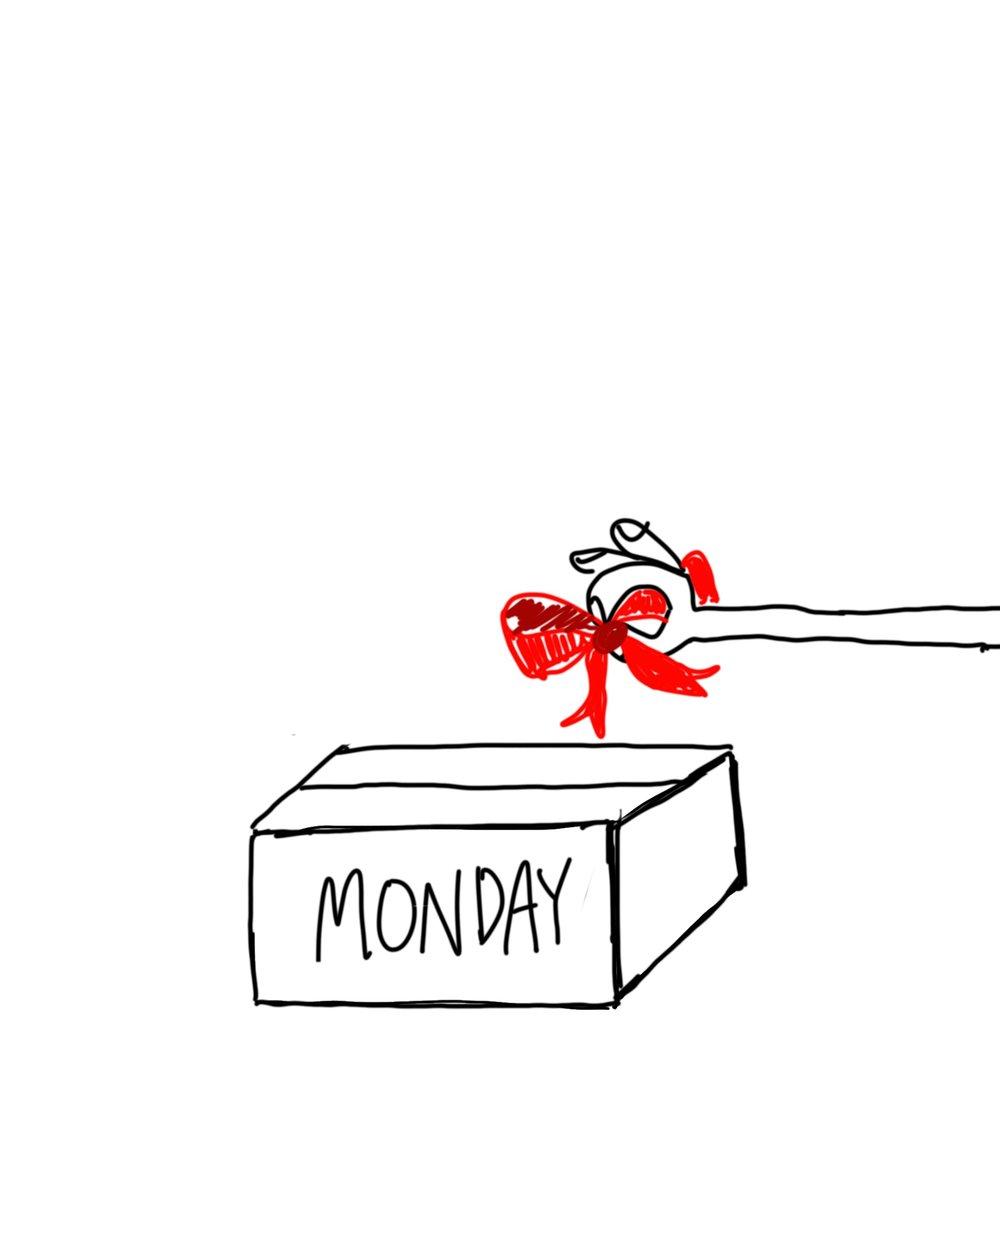 Mondays 10.jpg